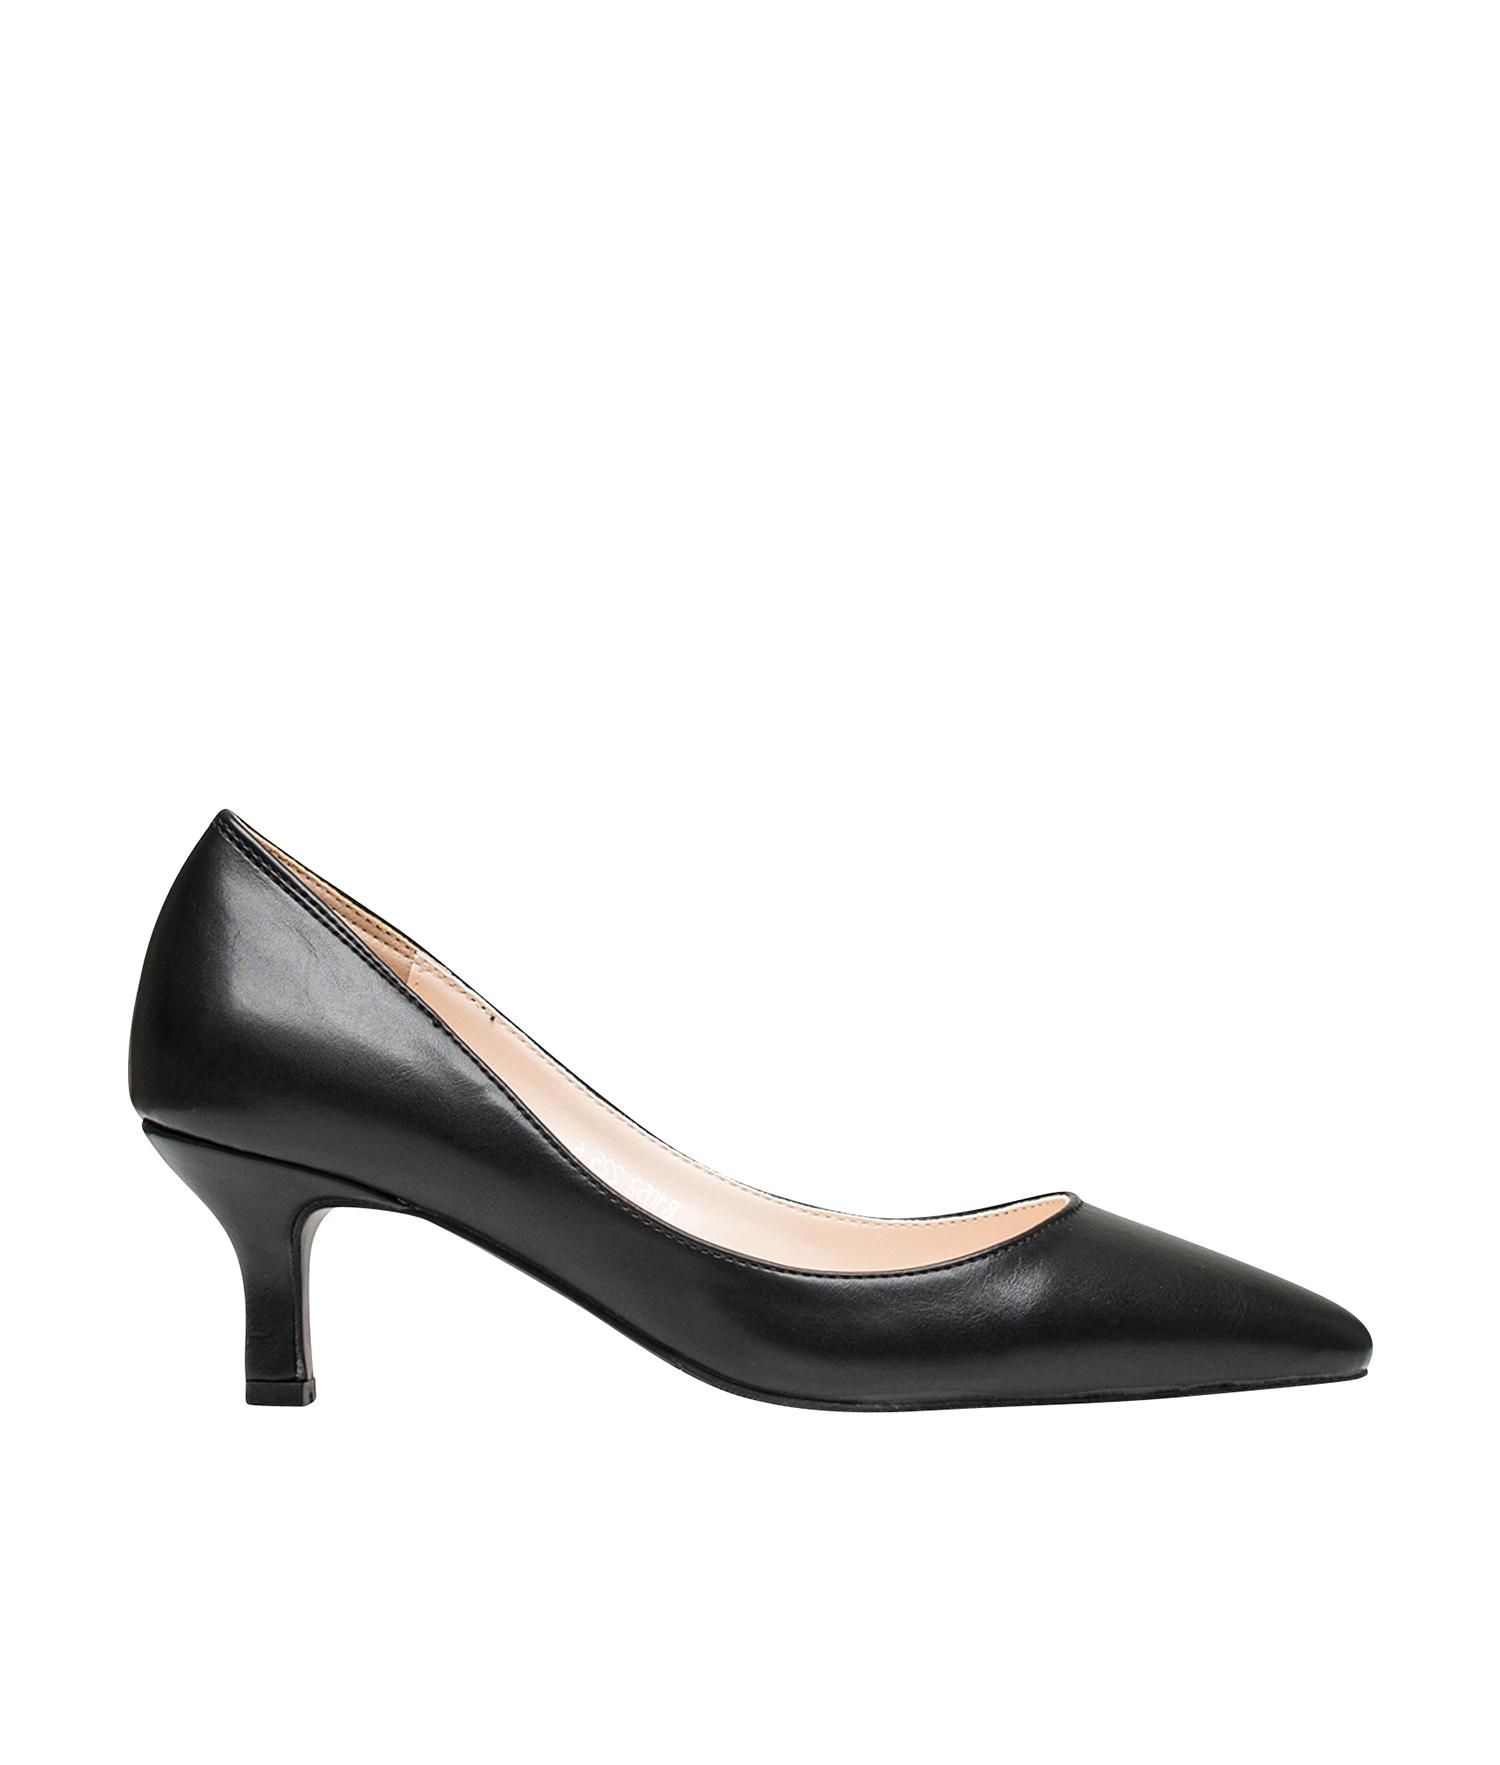 AnnaKastle Womens Classic Pointy Toe Kitten Heel Pumps Black